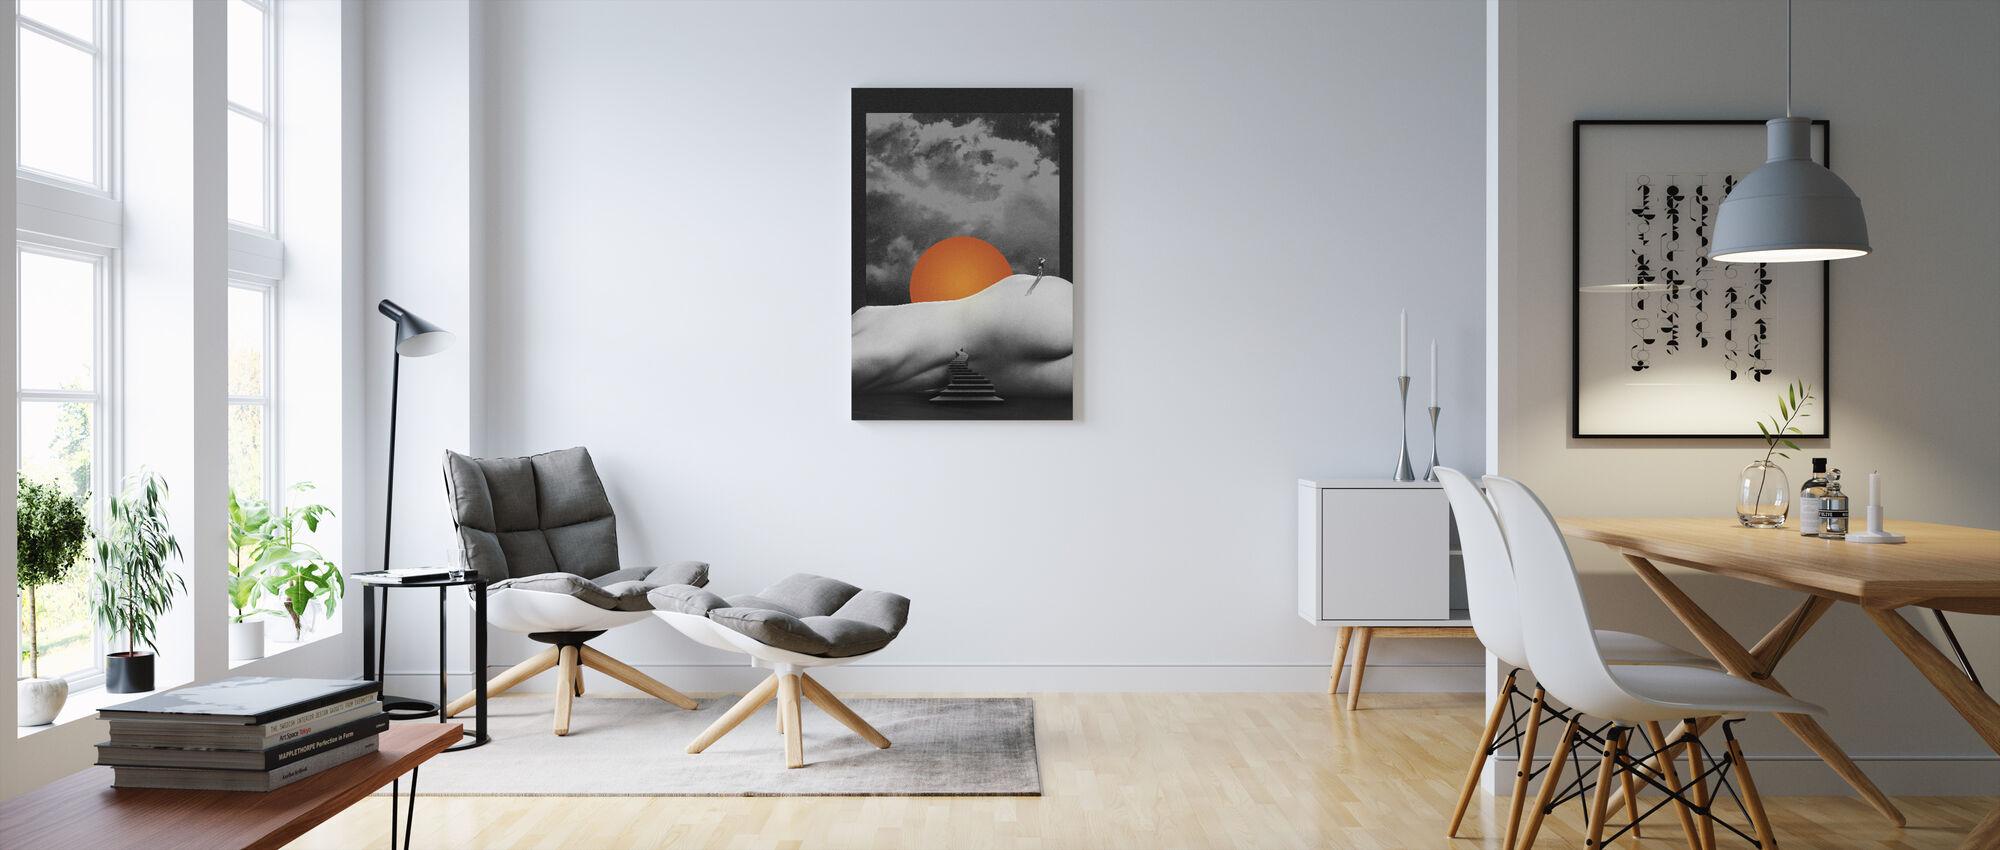 Temple - Canvas print - Living Room